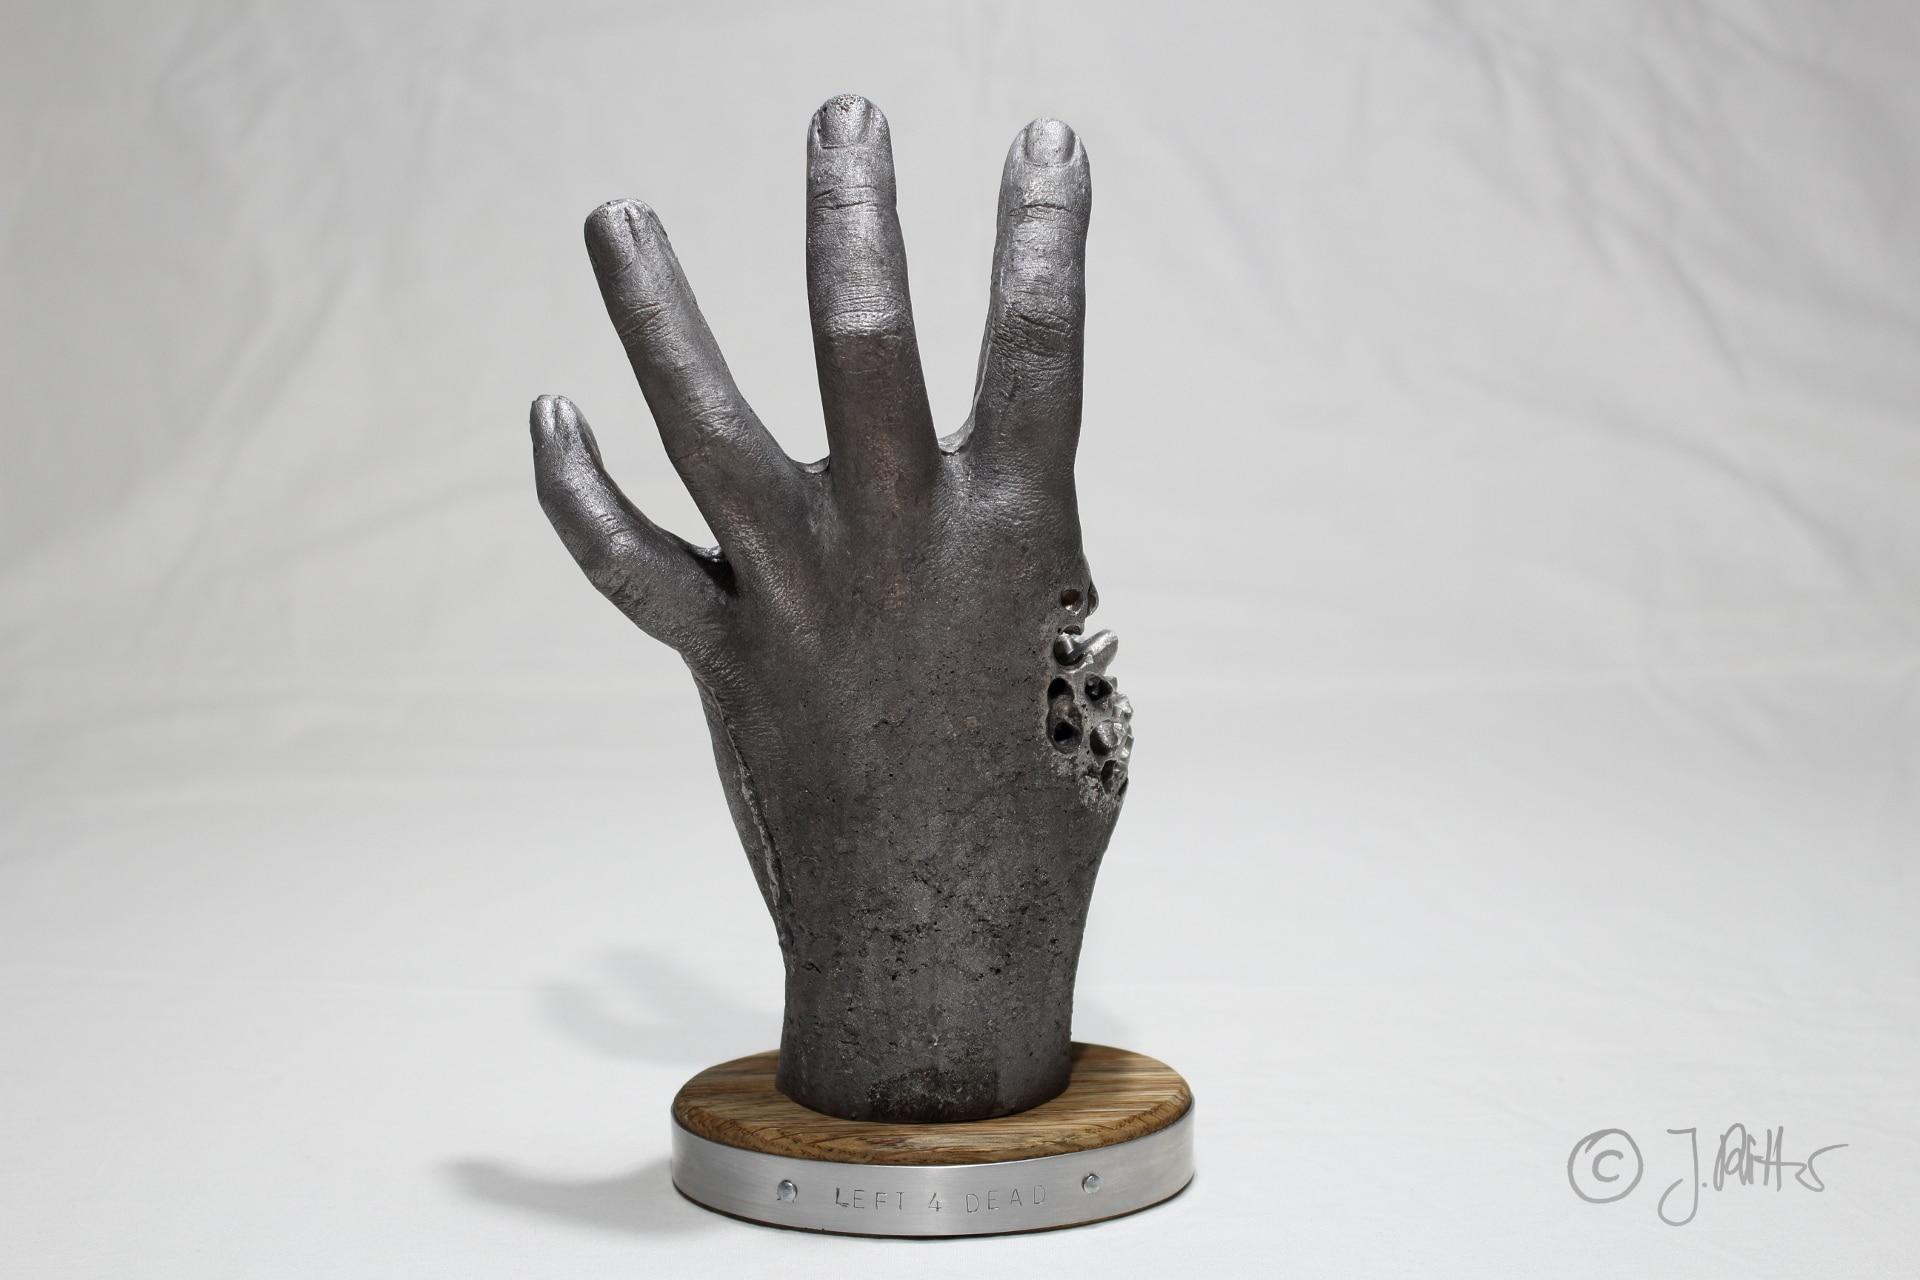 Left 4 Dead: Gruselige Zombie-Hand aus Aluschrott